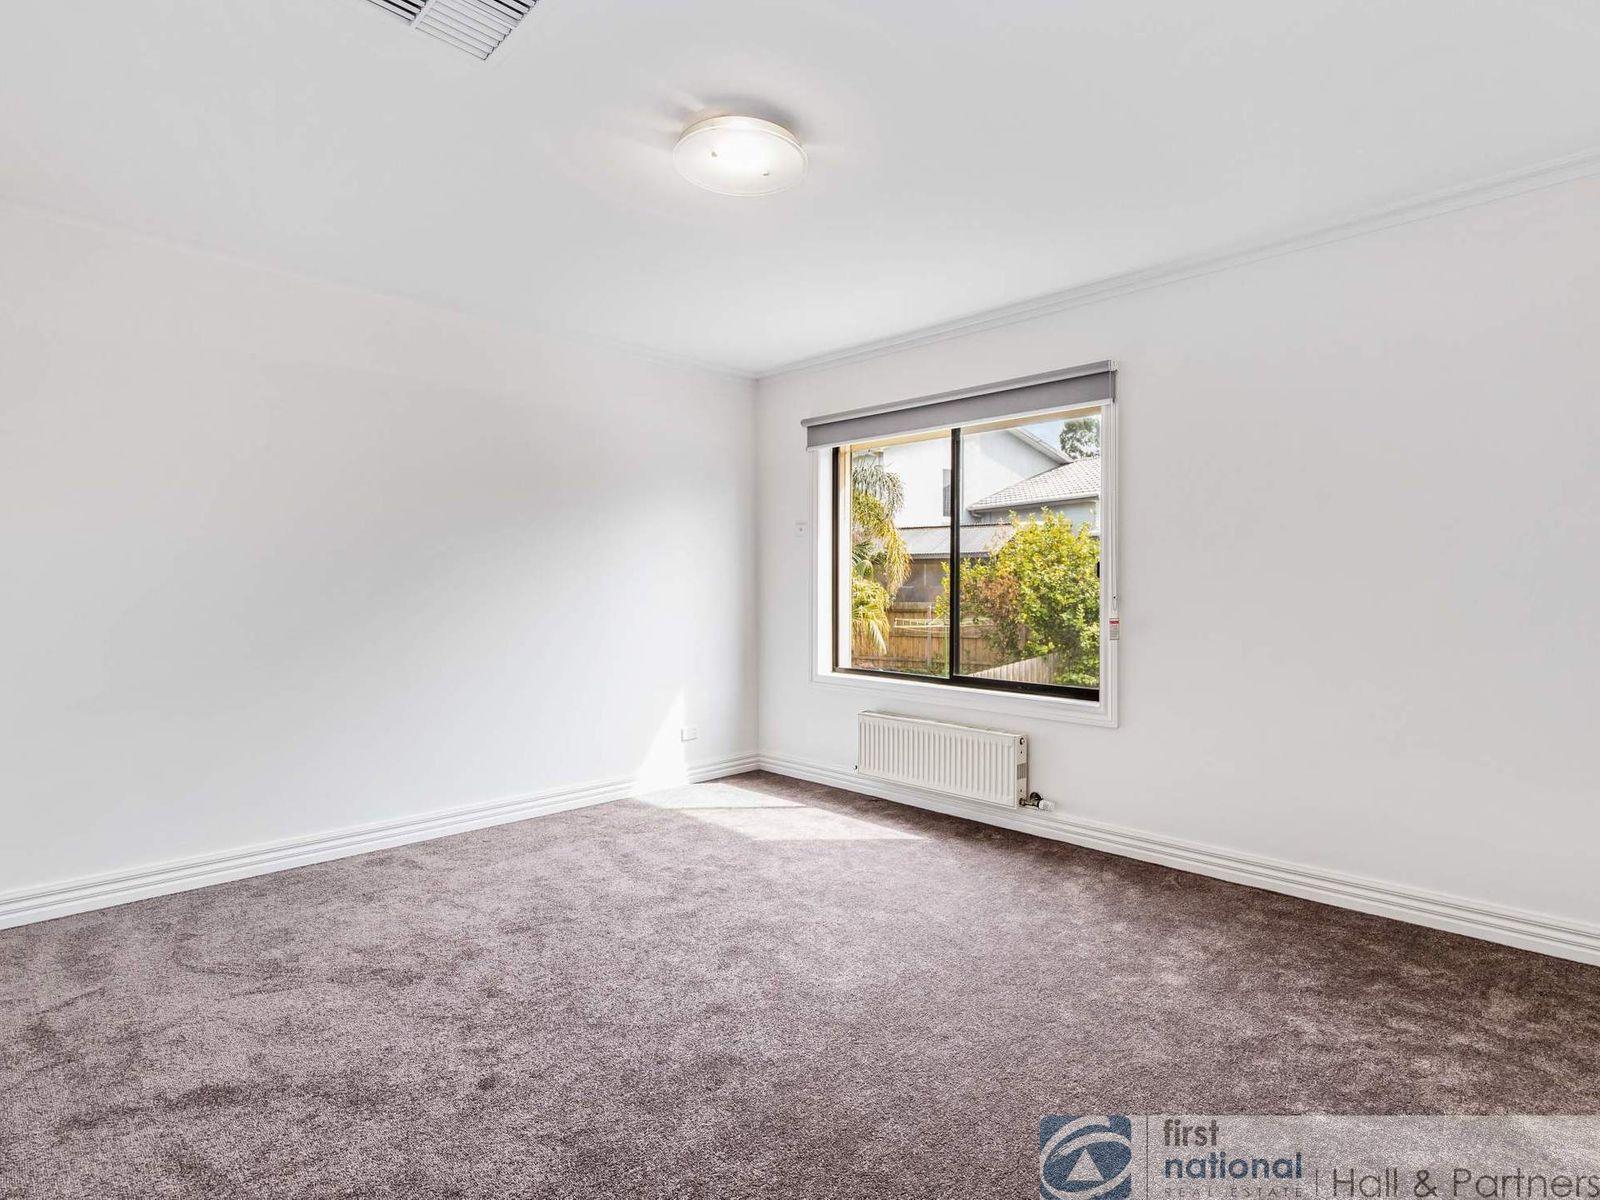 18 Cunningham Drive, Endeavour Hills, VIC 3802